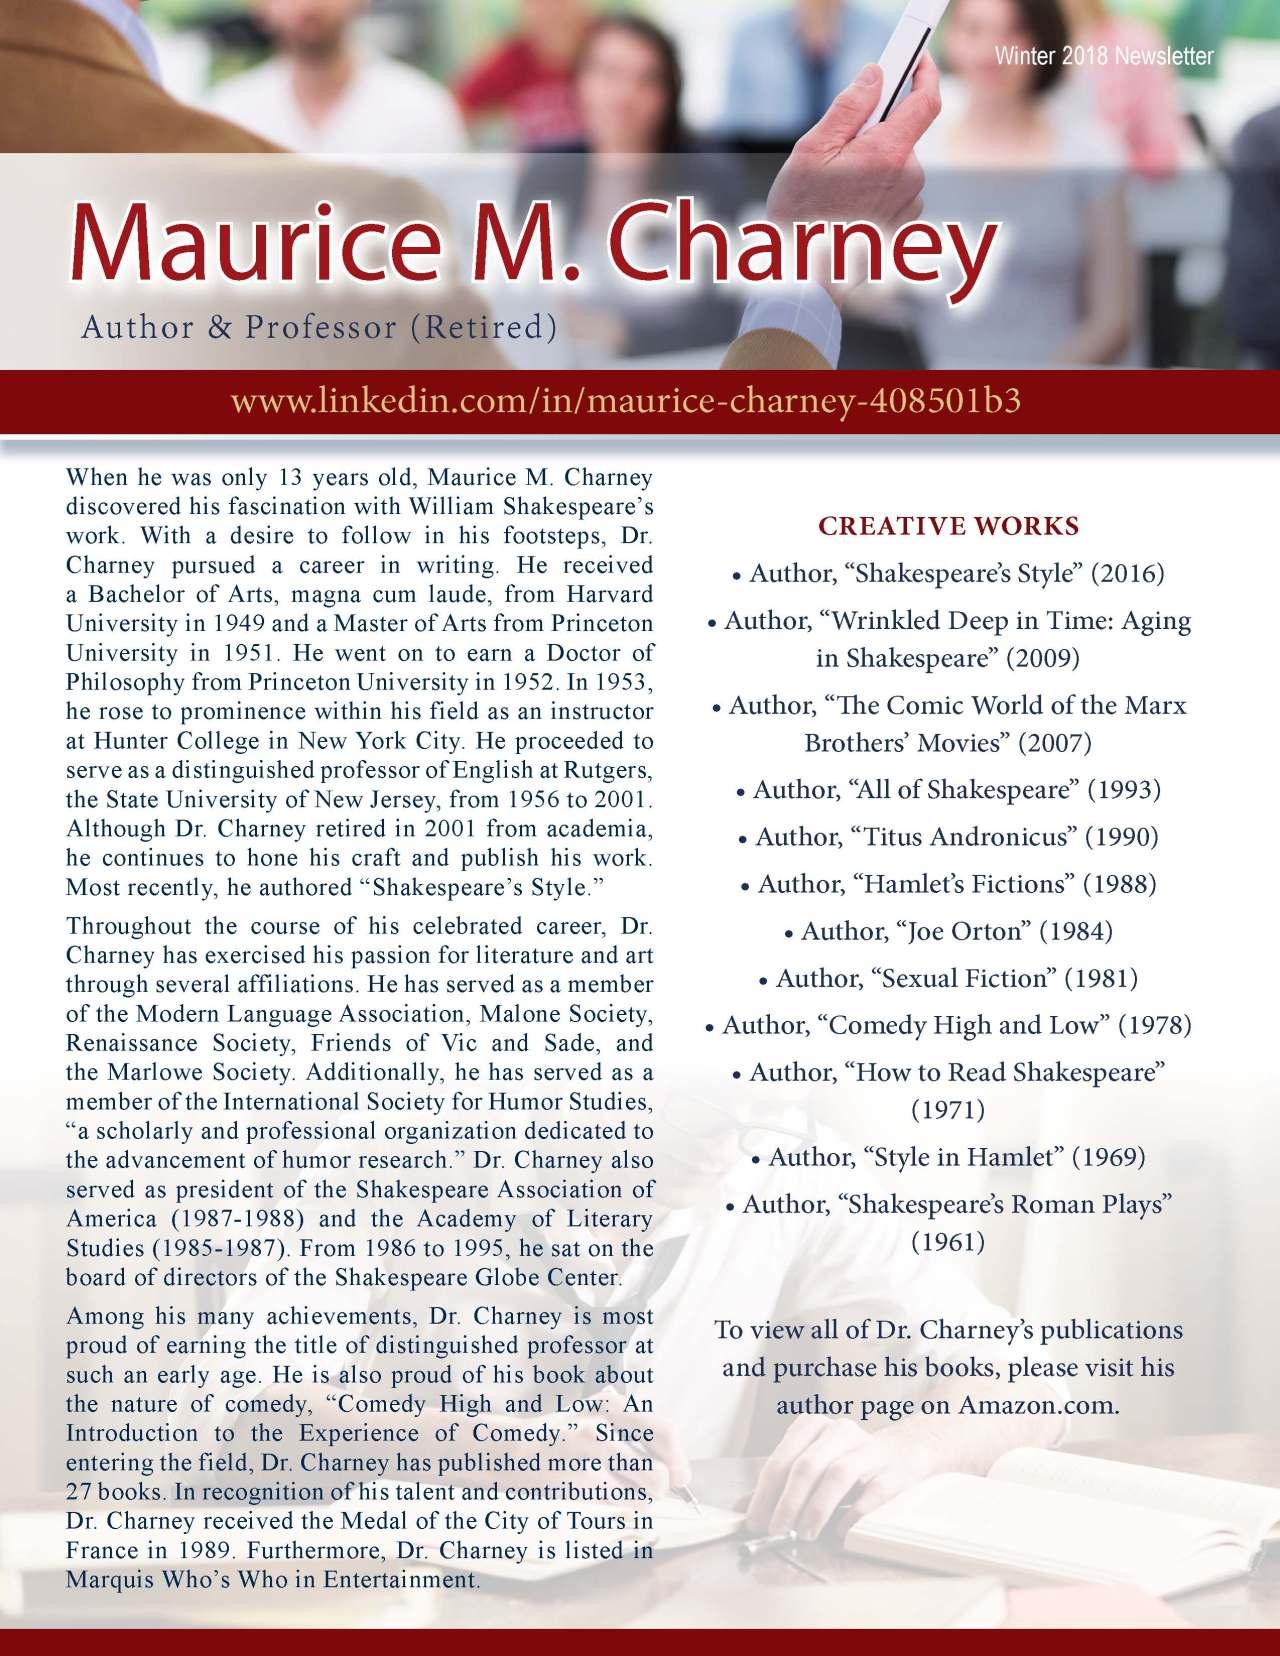 Charney, Maurice 3693647_19813039 Newsletter REVISED.jpg